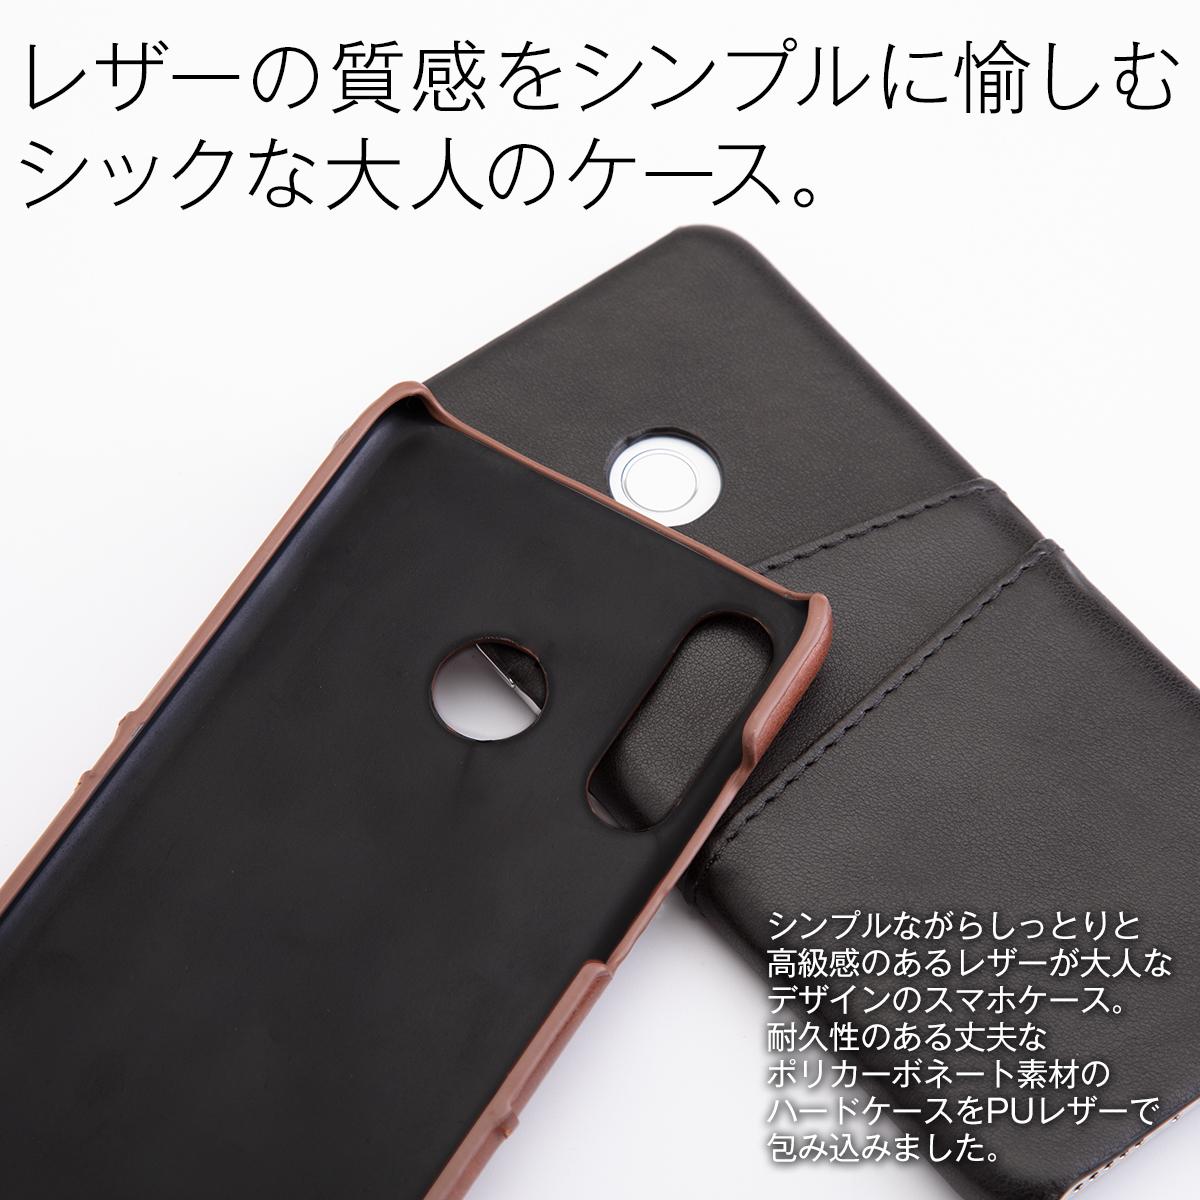 P30 lite HWV33 HWU36 カードポケット付きハードケース